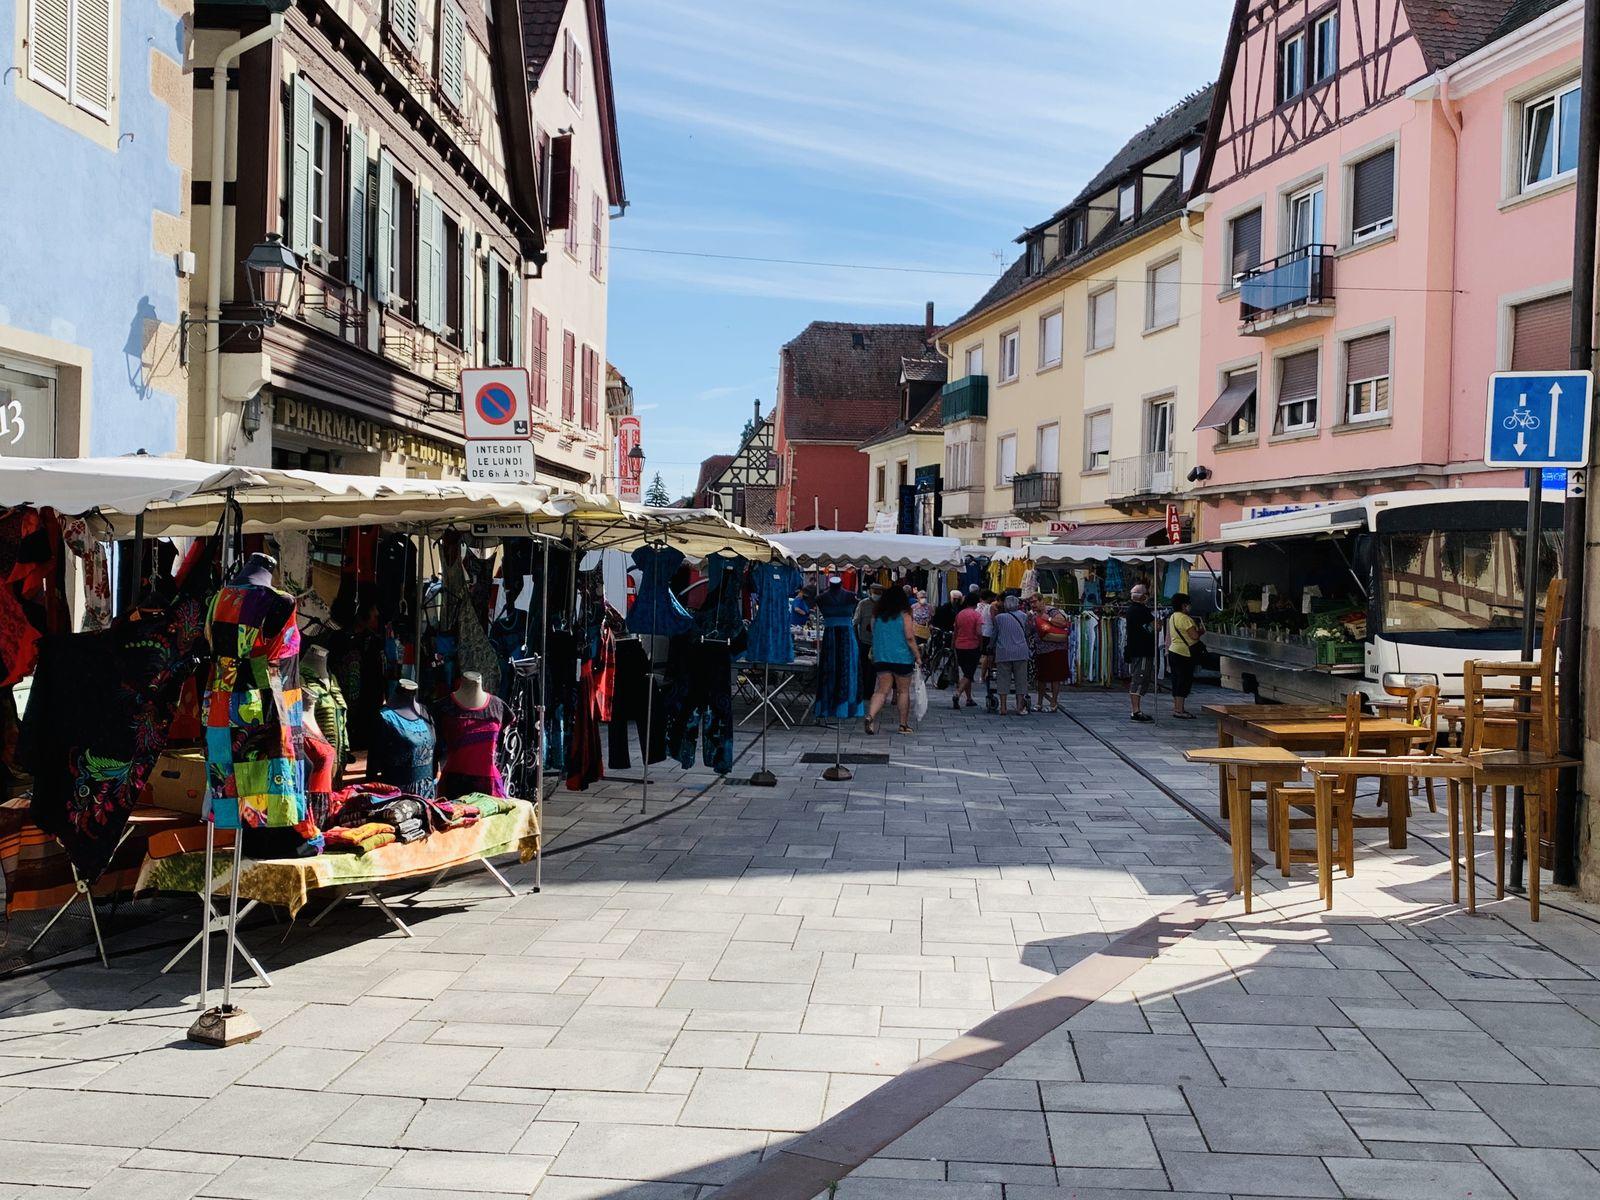 https://apps.tourisme-alsace.info/photos/grandried/photos/227000638_1.jpg